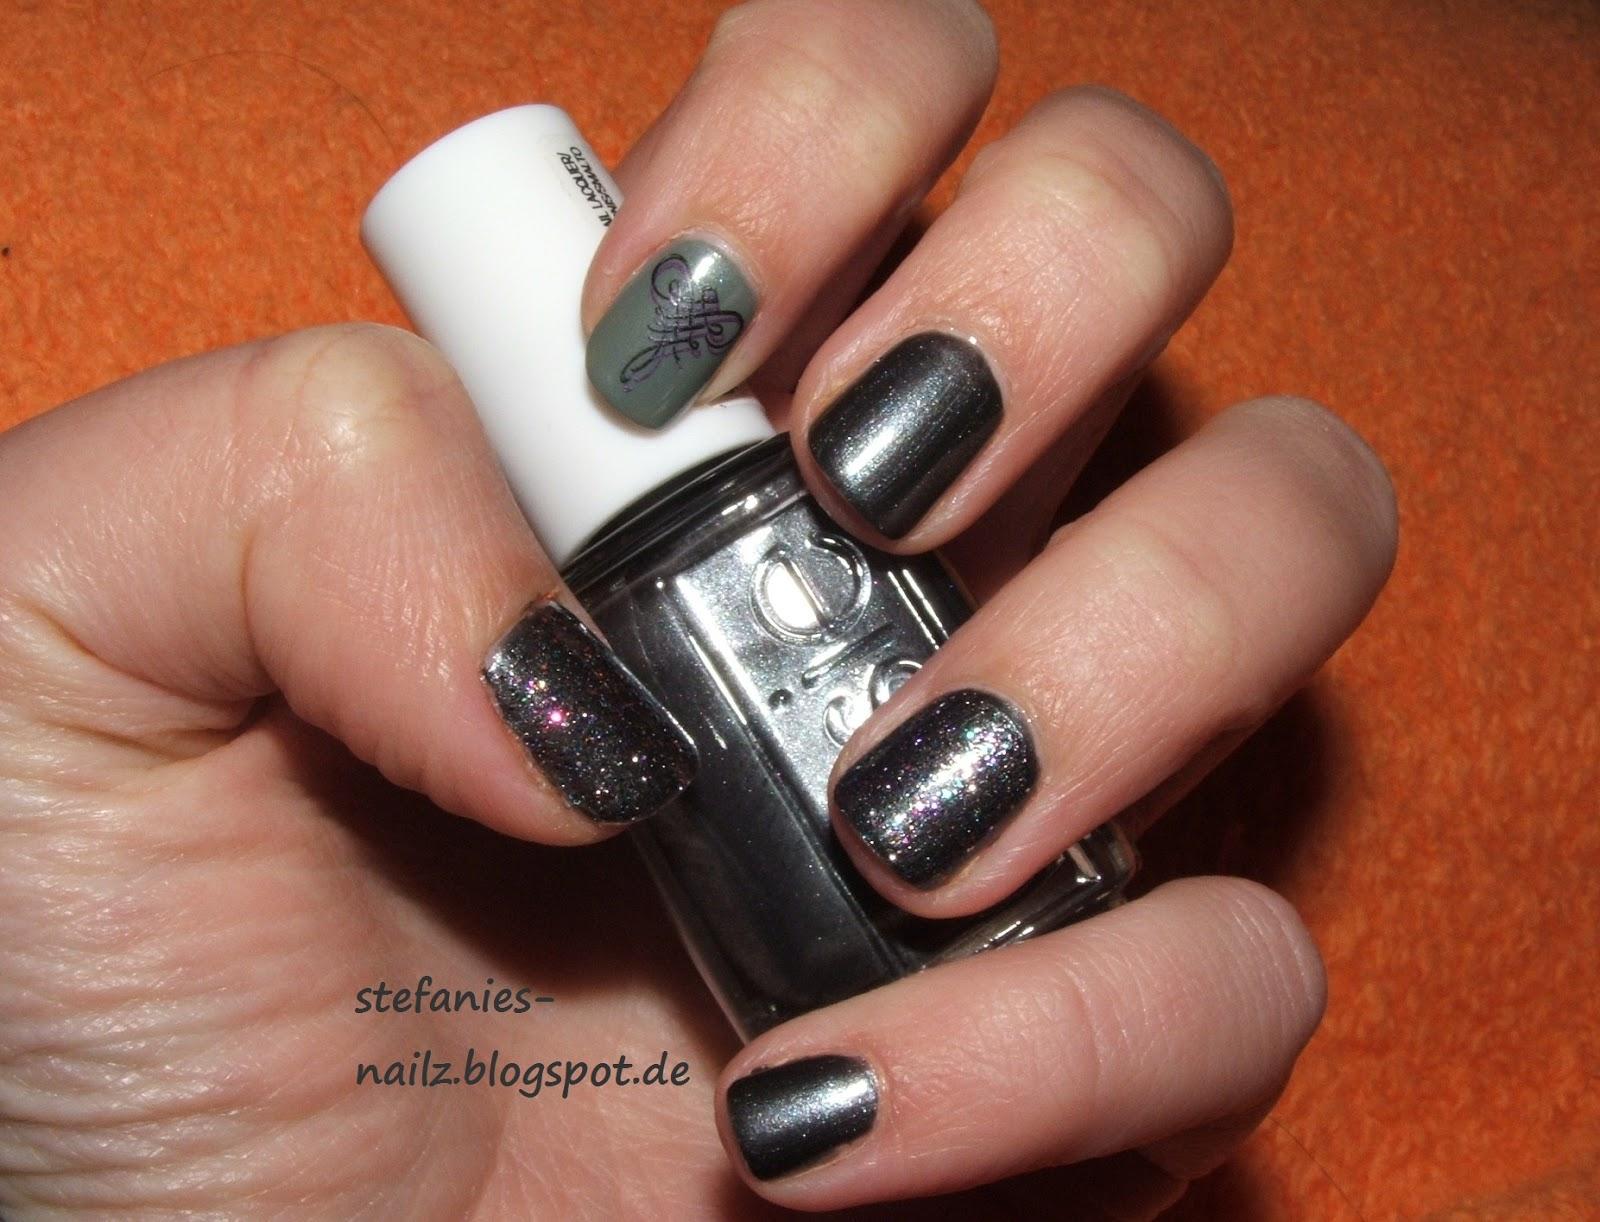 Stefanie 39 s nailz graues nagellack design grey nail - Nagellack designs ...